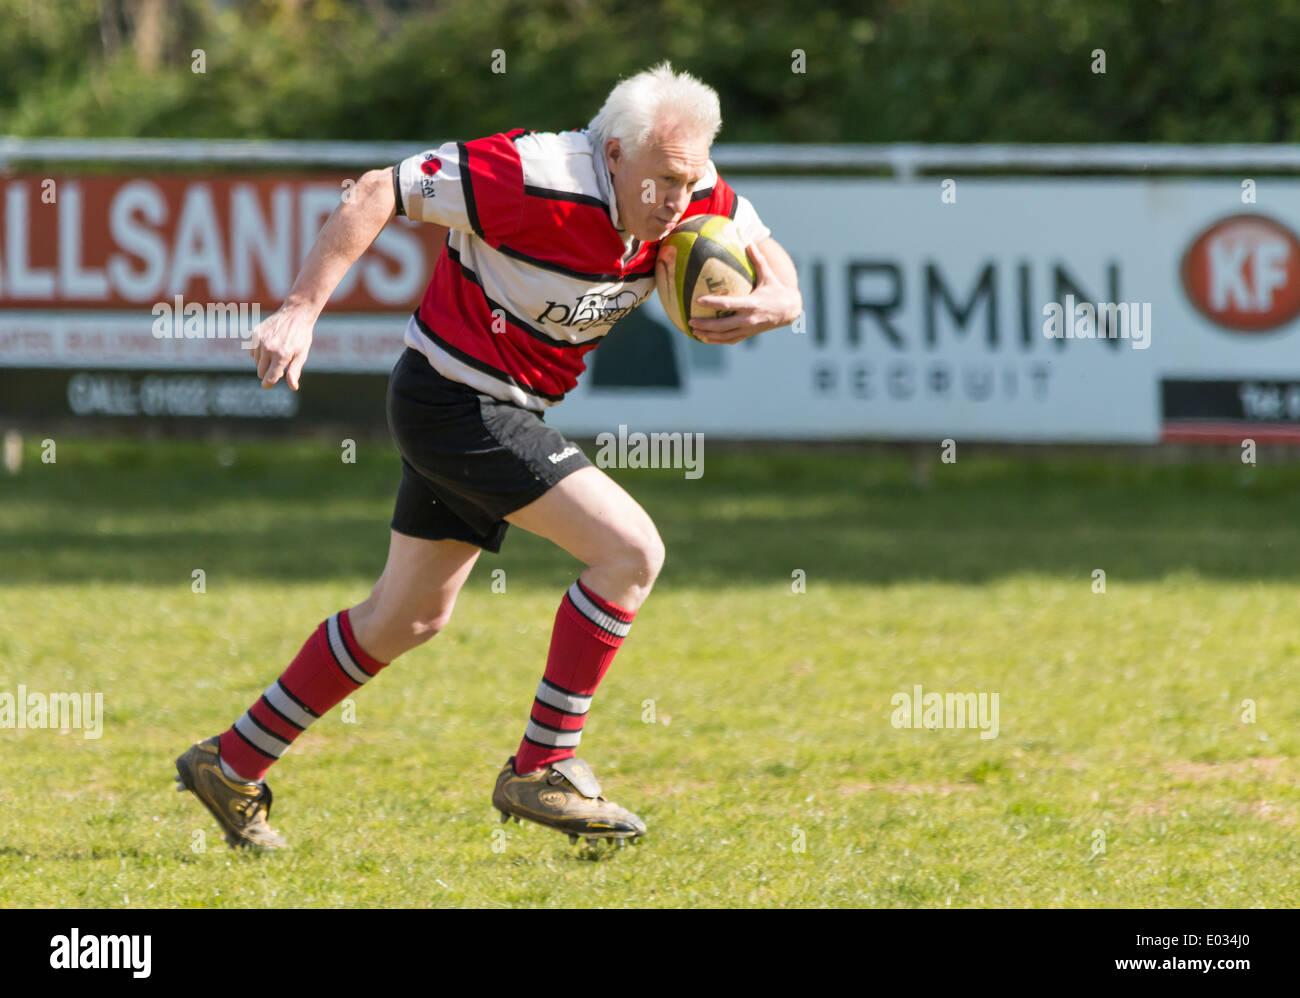 Joueur de Rugby mature courir avec Ball Photo Stock